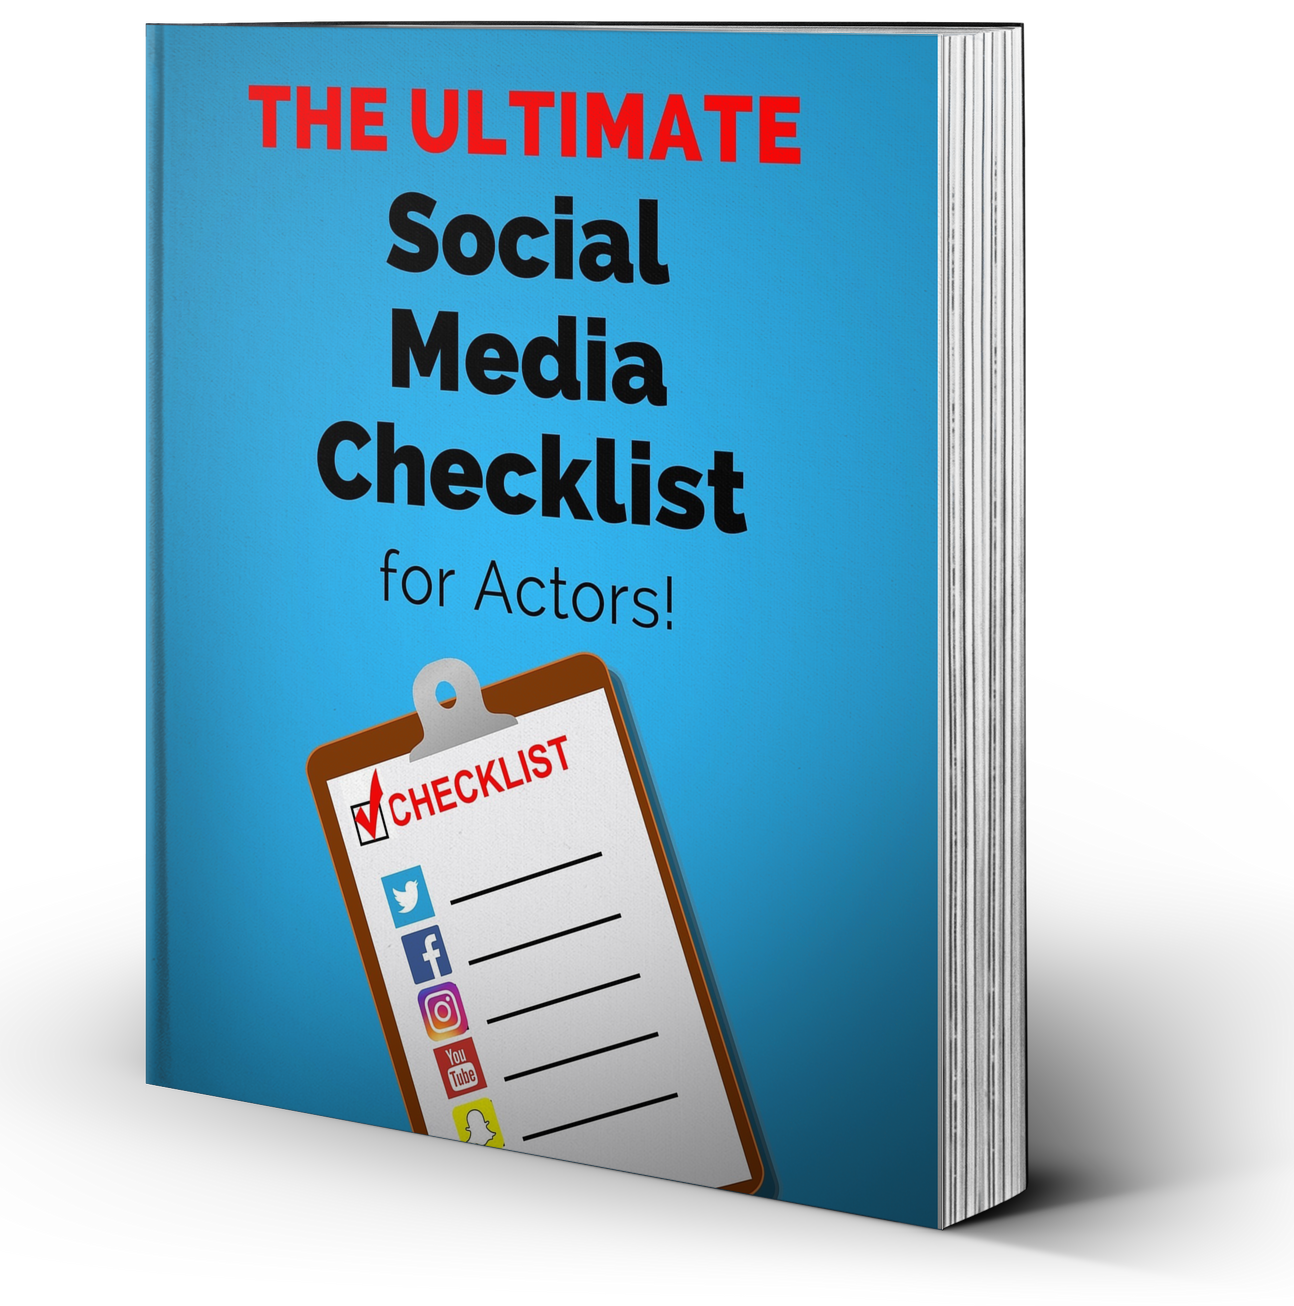 ultimate social media for actors by Heidi Dean